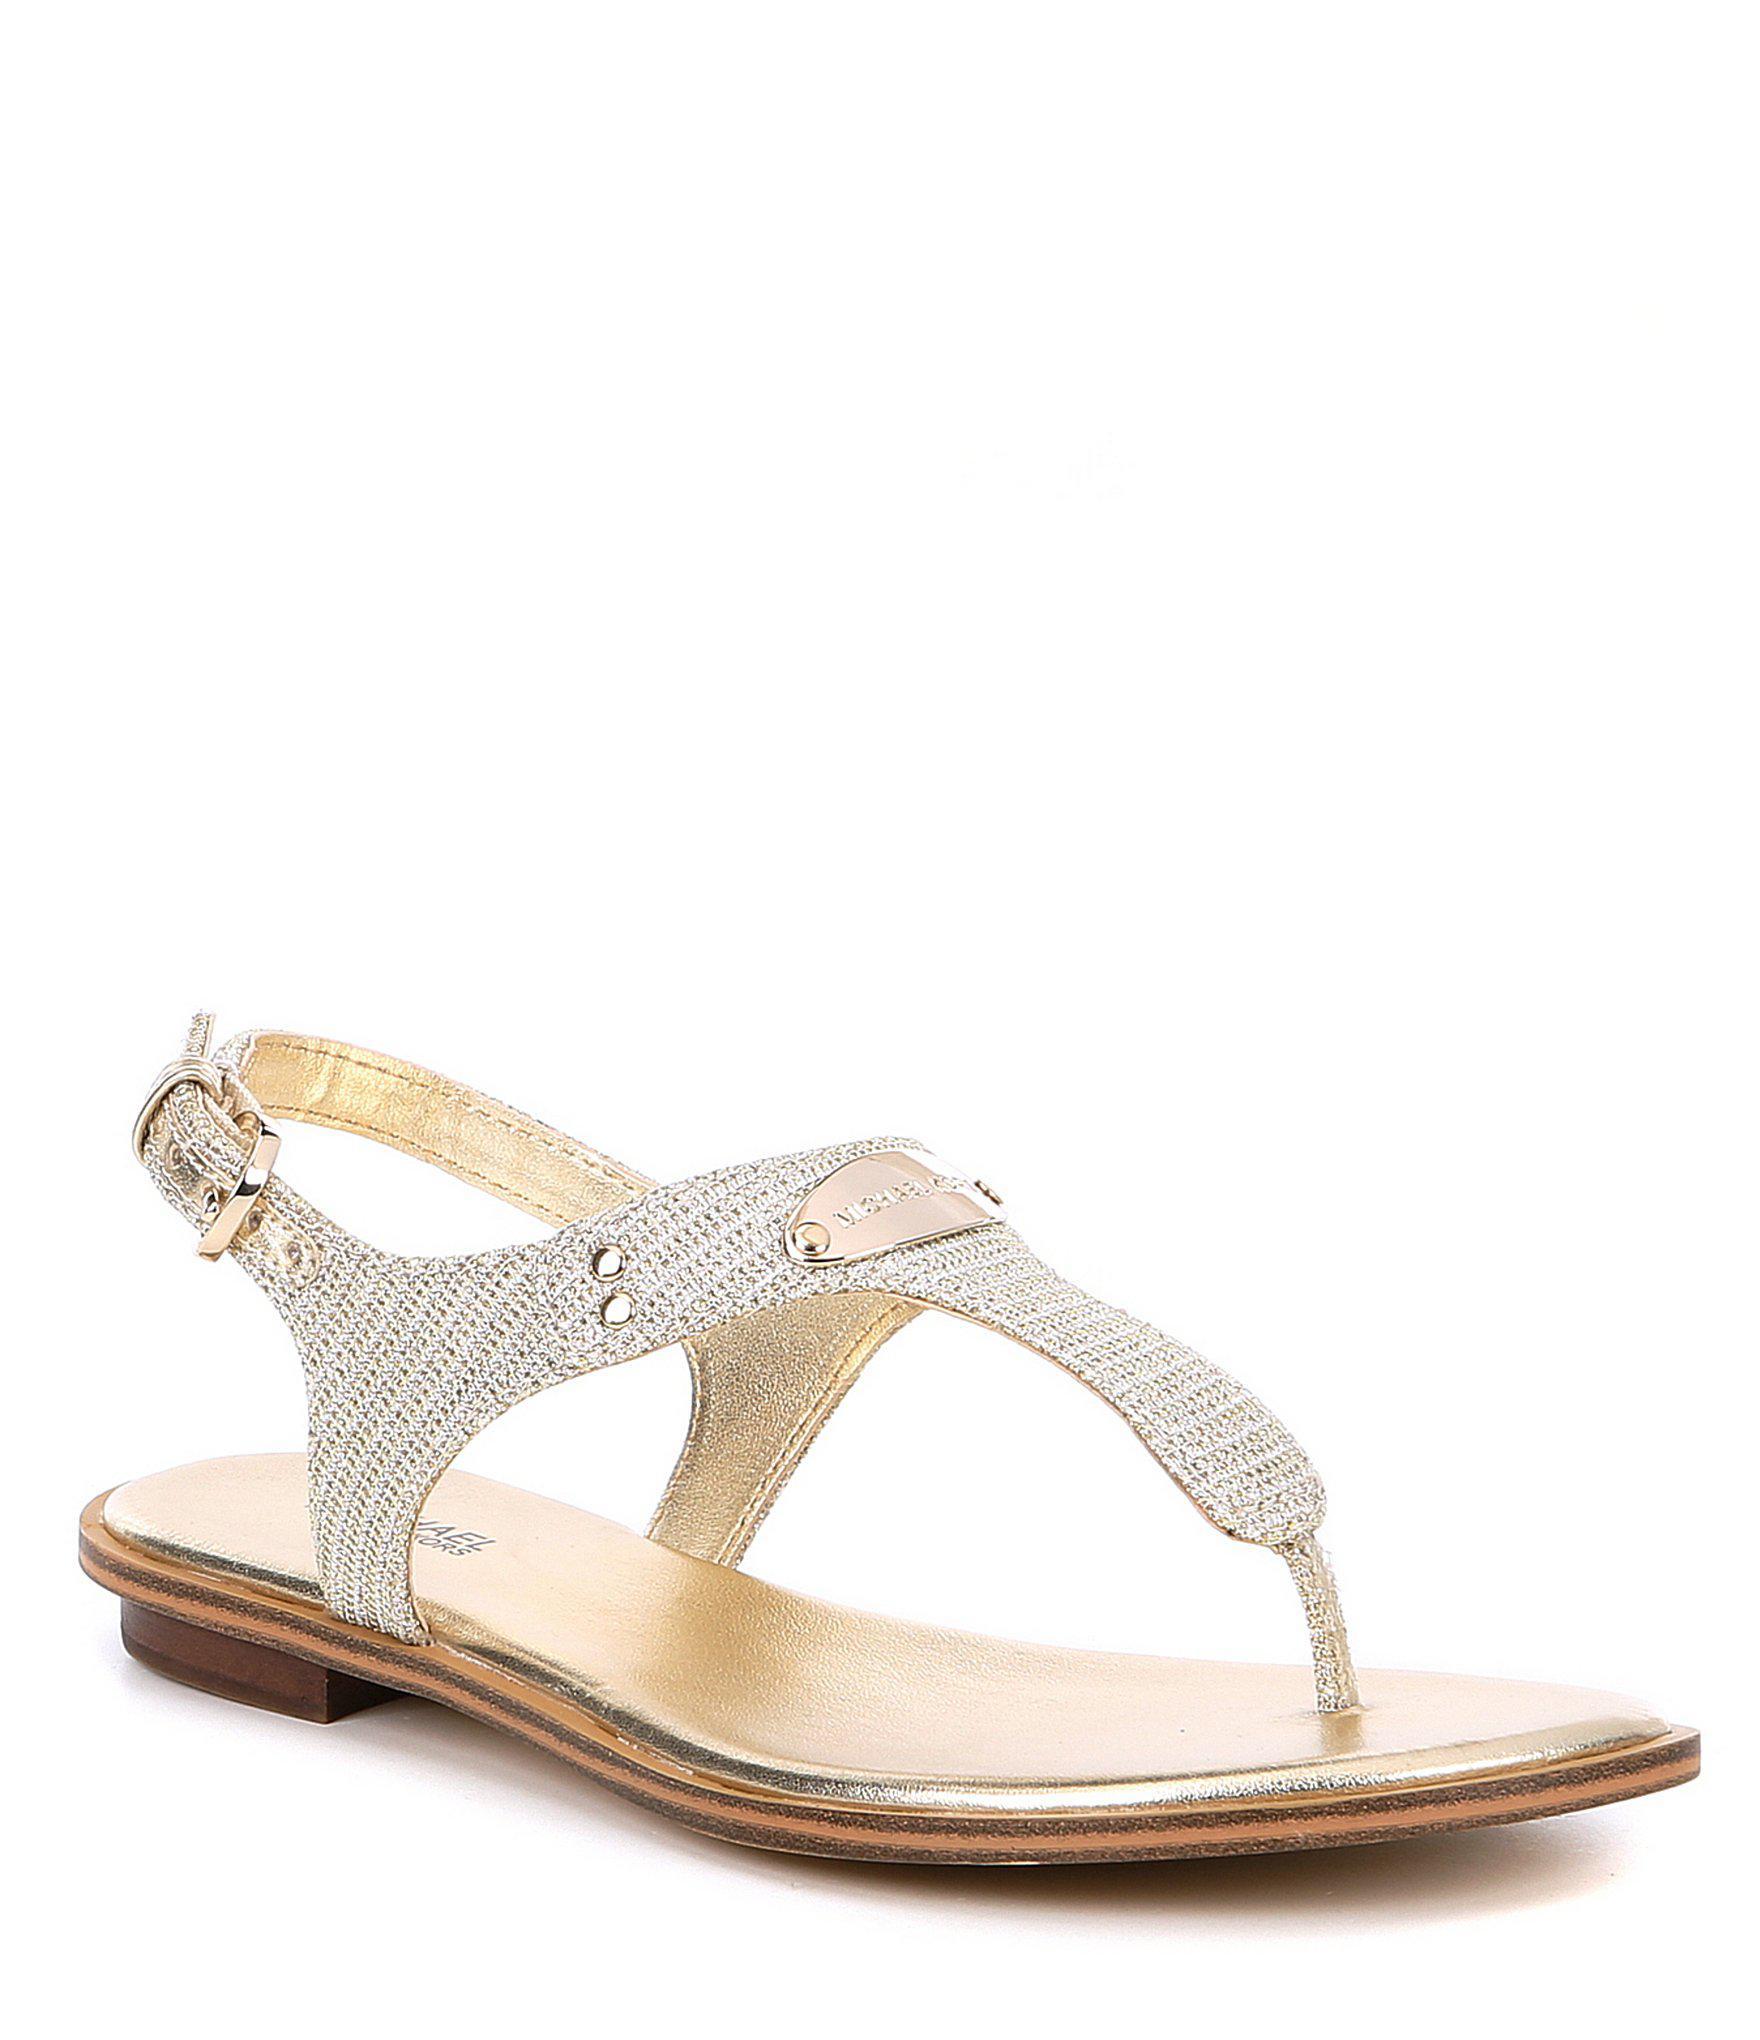 304cee2df9ab MICHAEL Michael Kors Mk Plate Metallic Thong Sandals in Metallic - Lyst